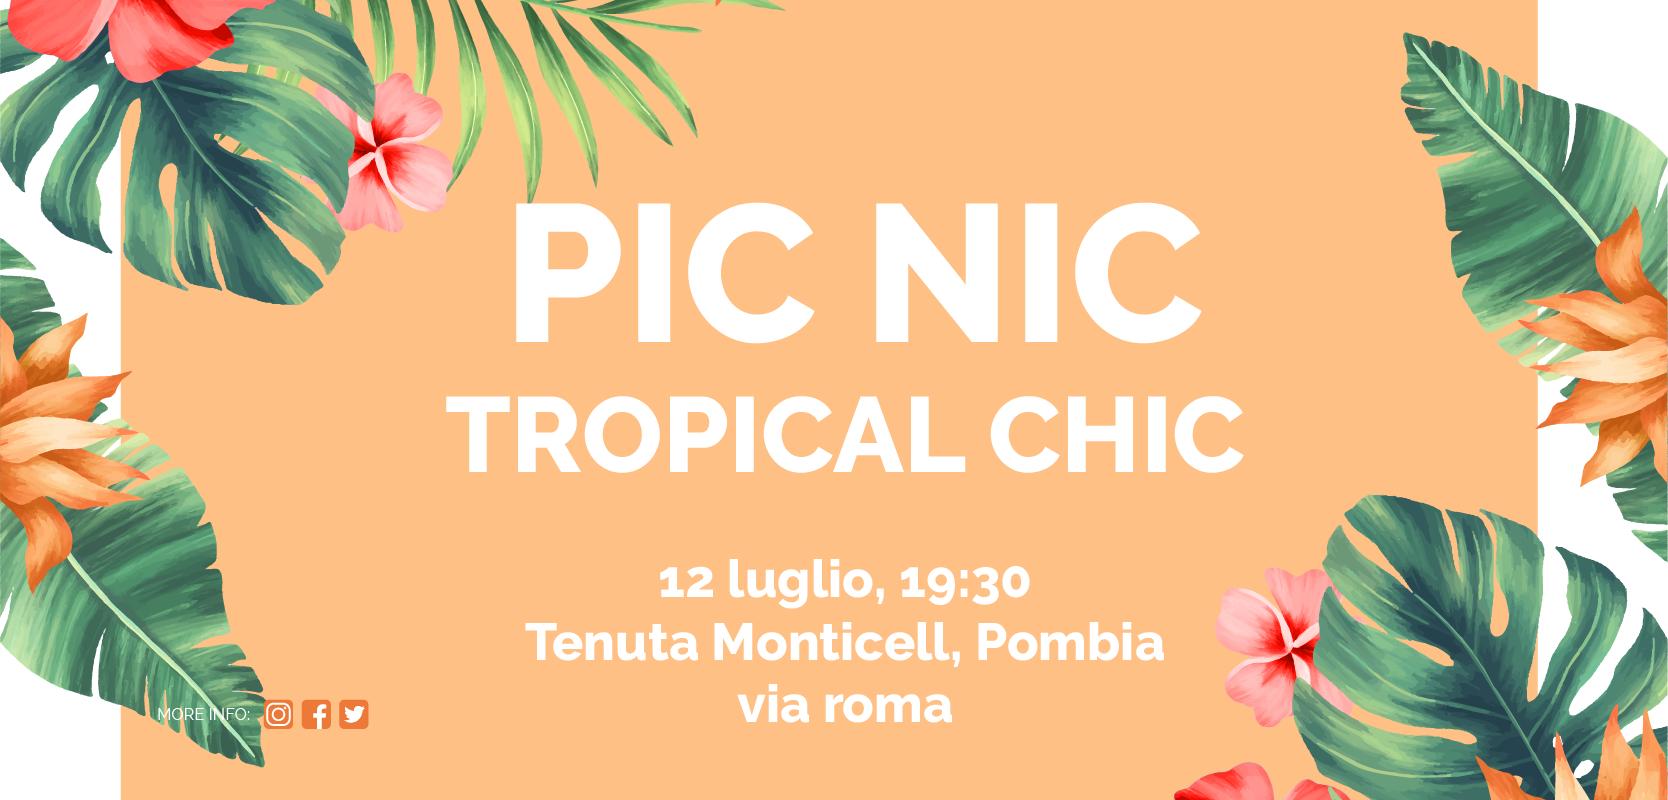 picnic tropical chic